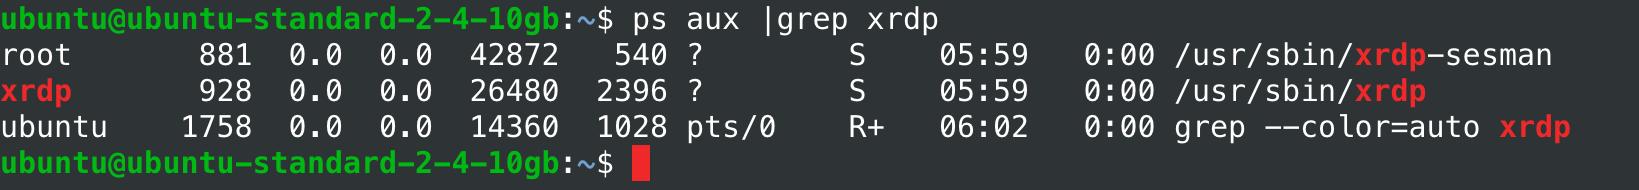 VPS на Linux с графическим интерфейсом: запускаем сервер RDP на Ubuntu 18.04 - 7